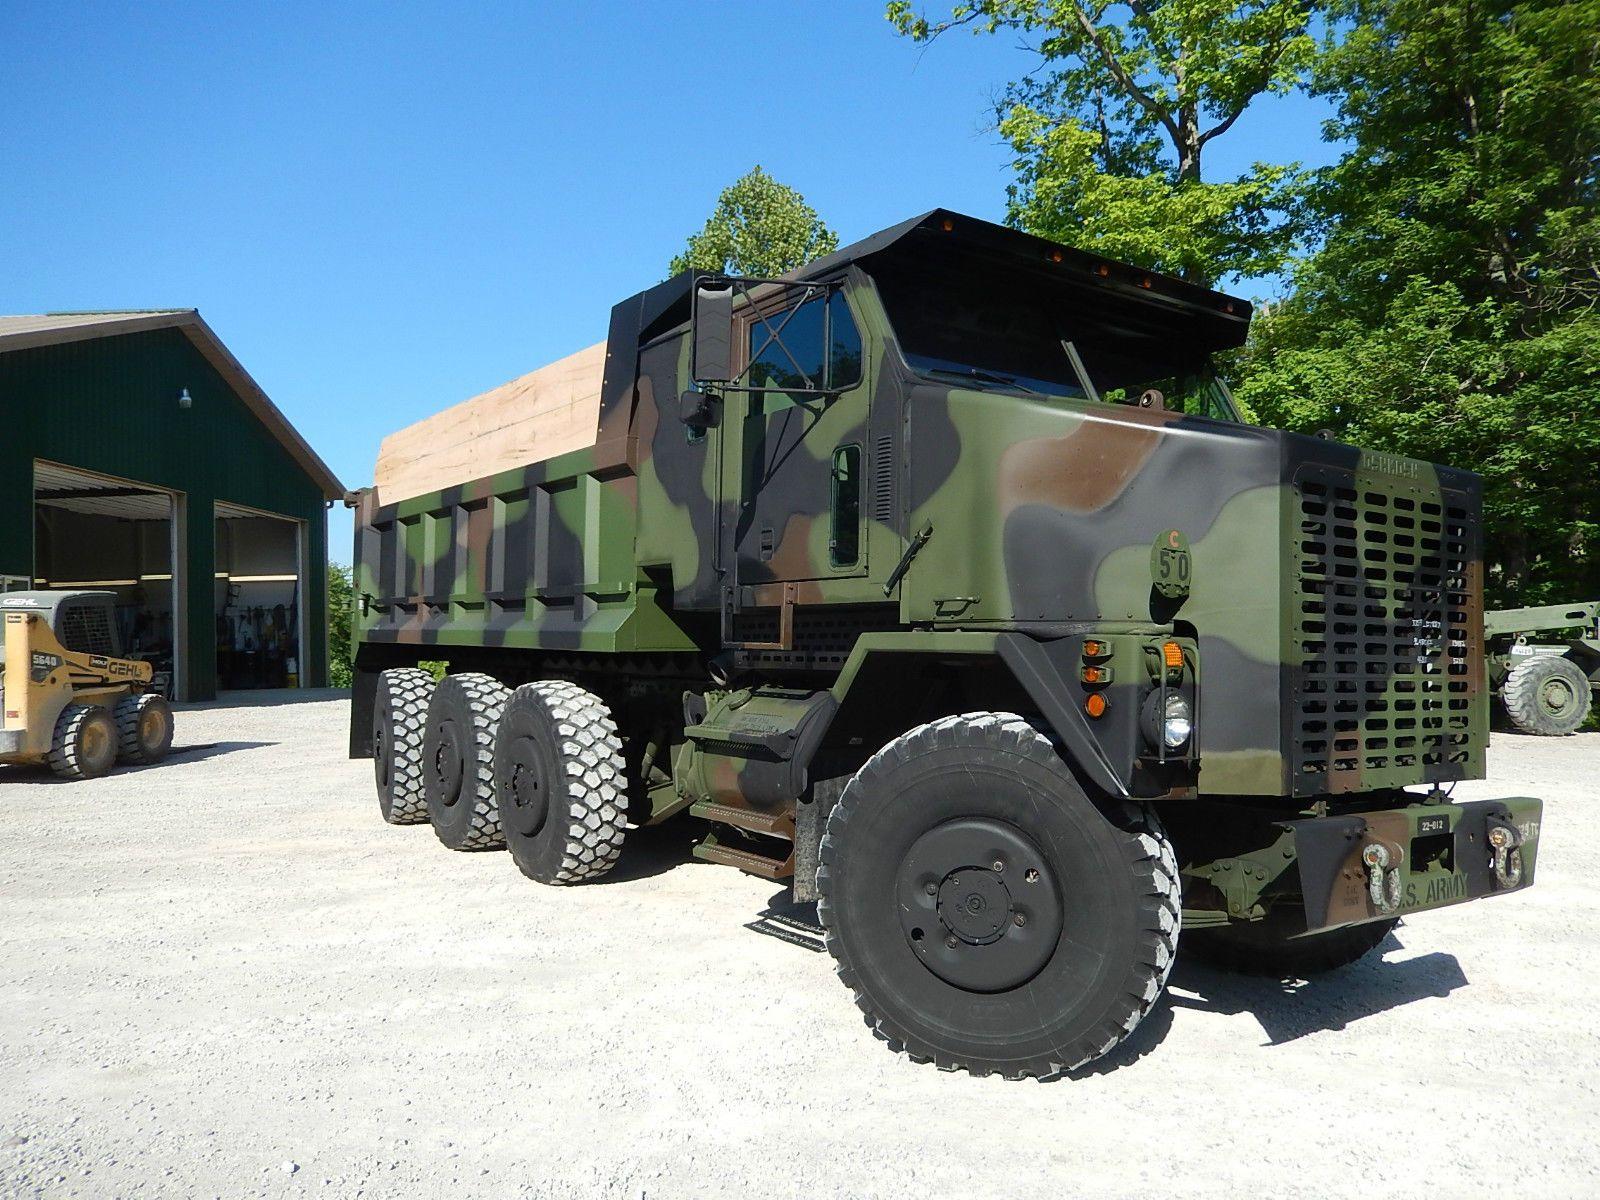 oshkosh trucks - Google Search | Trucks | Pinterest | Vehicle ...